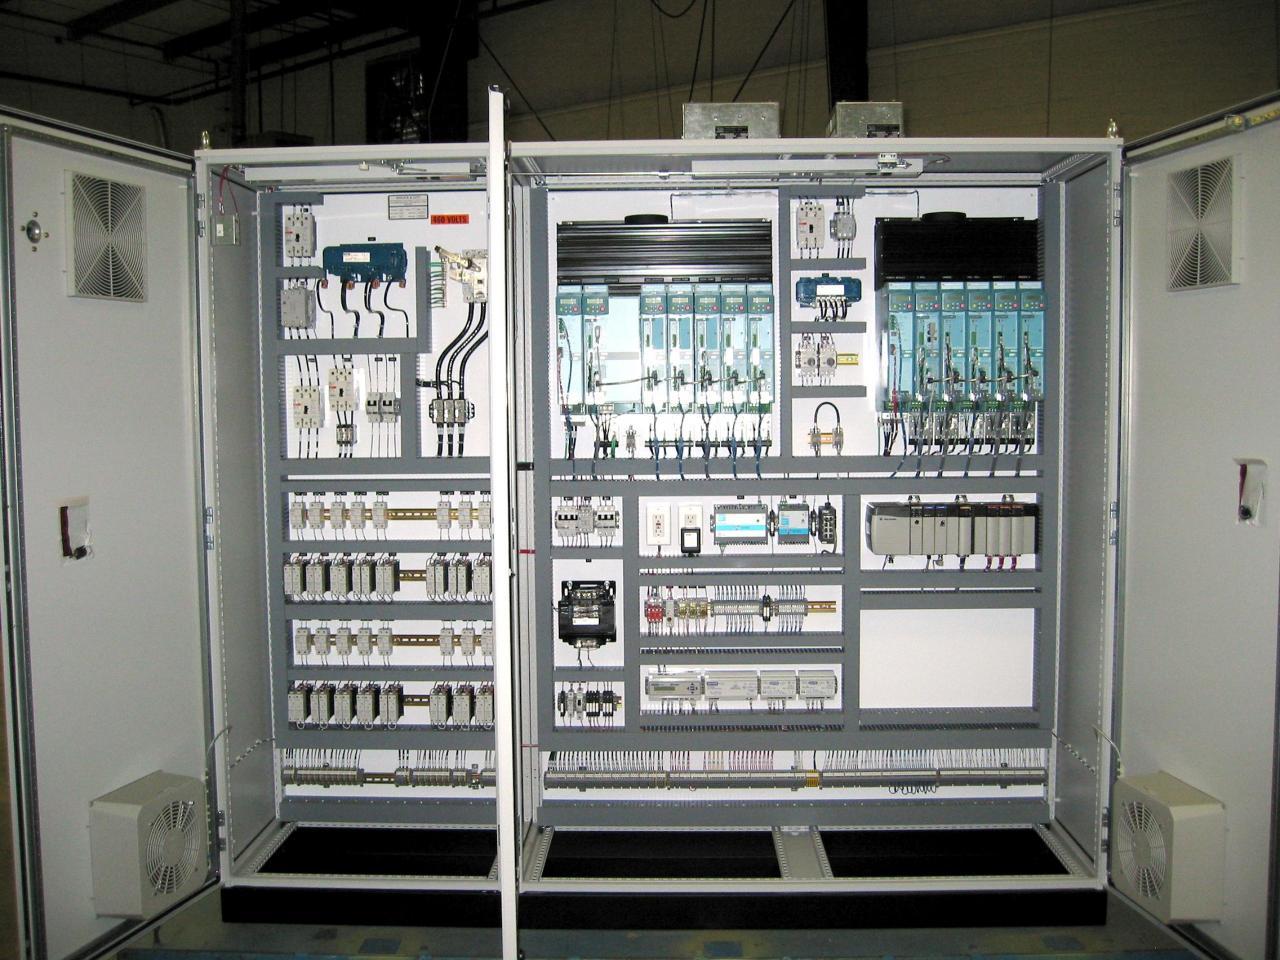 siemens vfd wiring diagram 1978 honda cb400a hmi